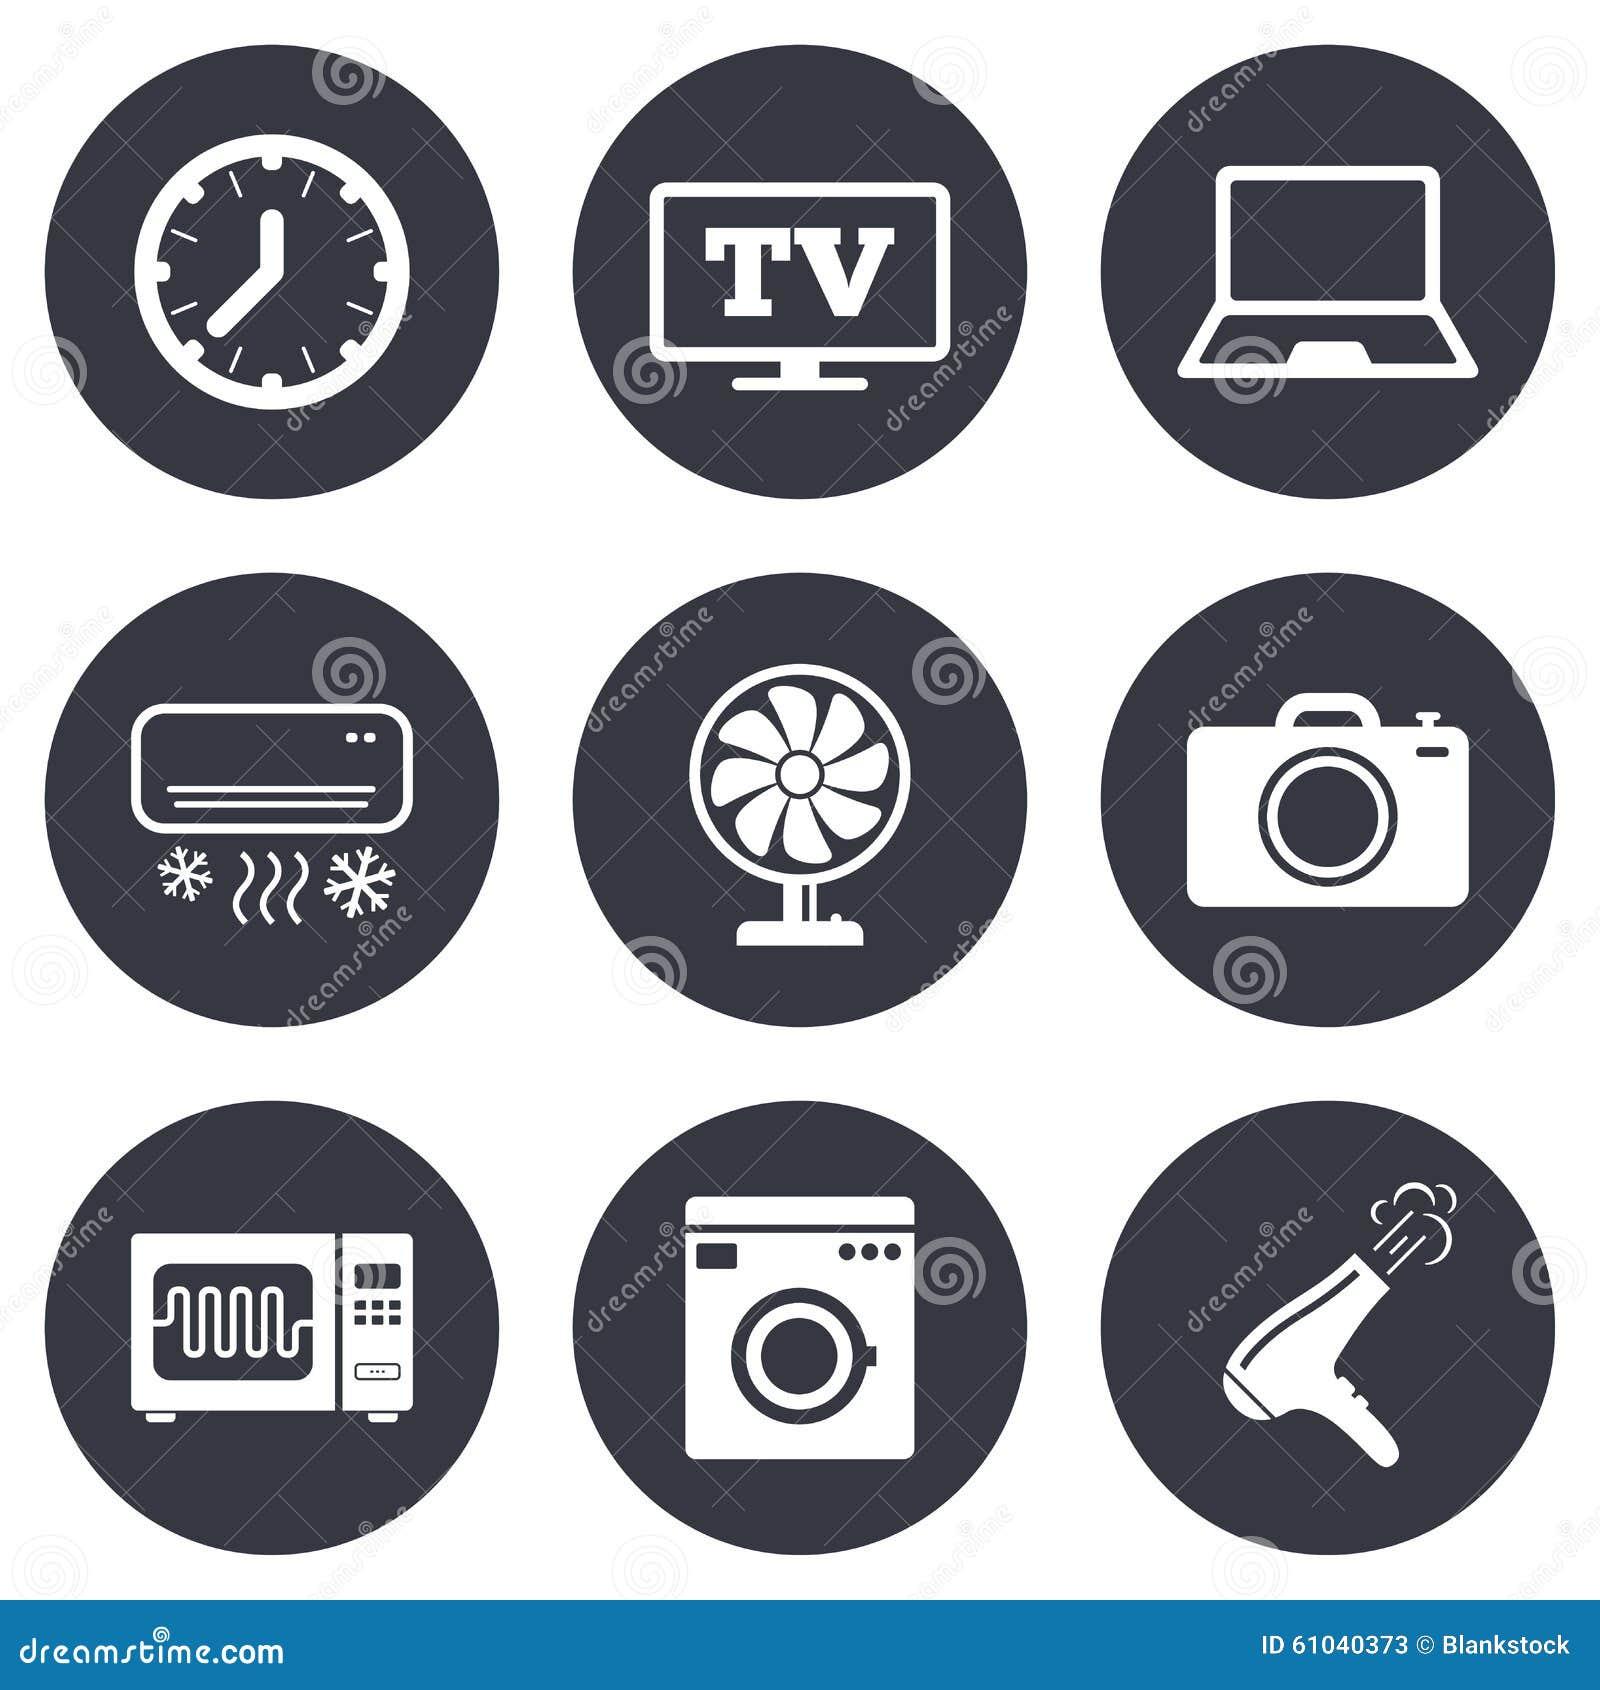 Home appliances device icons electronics sign stock vector home appliances device icons electronics sign buycottarizona